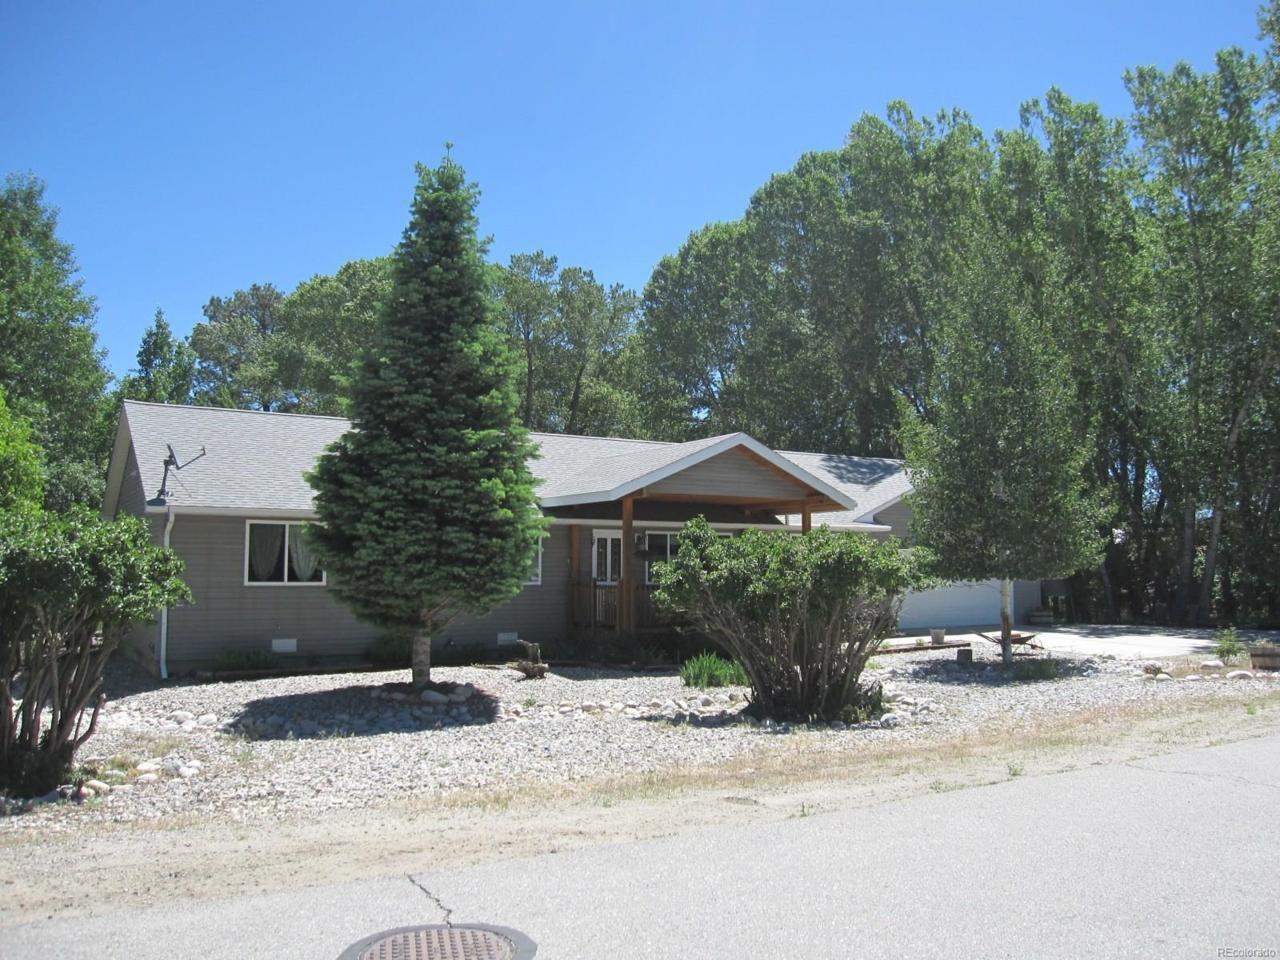 123 S Sangre De Cristo Avenue, Buena Vista, CO 81211 (MLS #4631350) :: 8z Real Estate